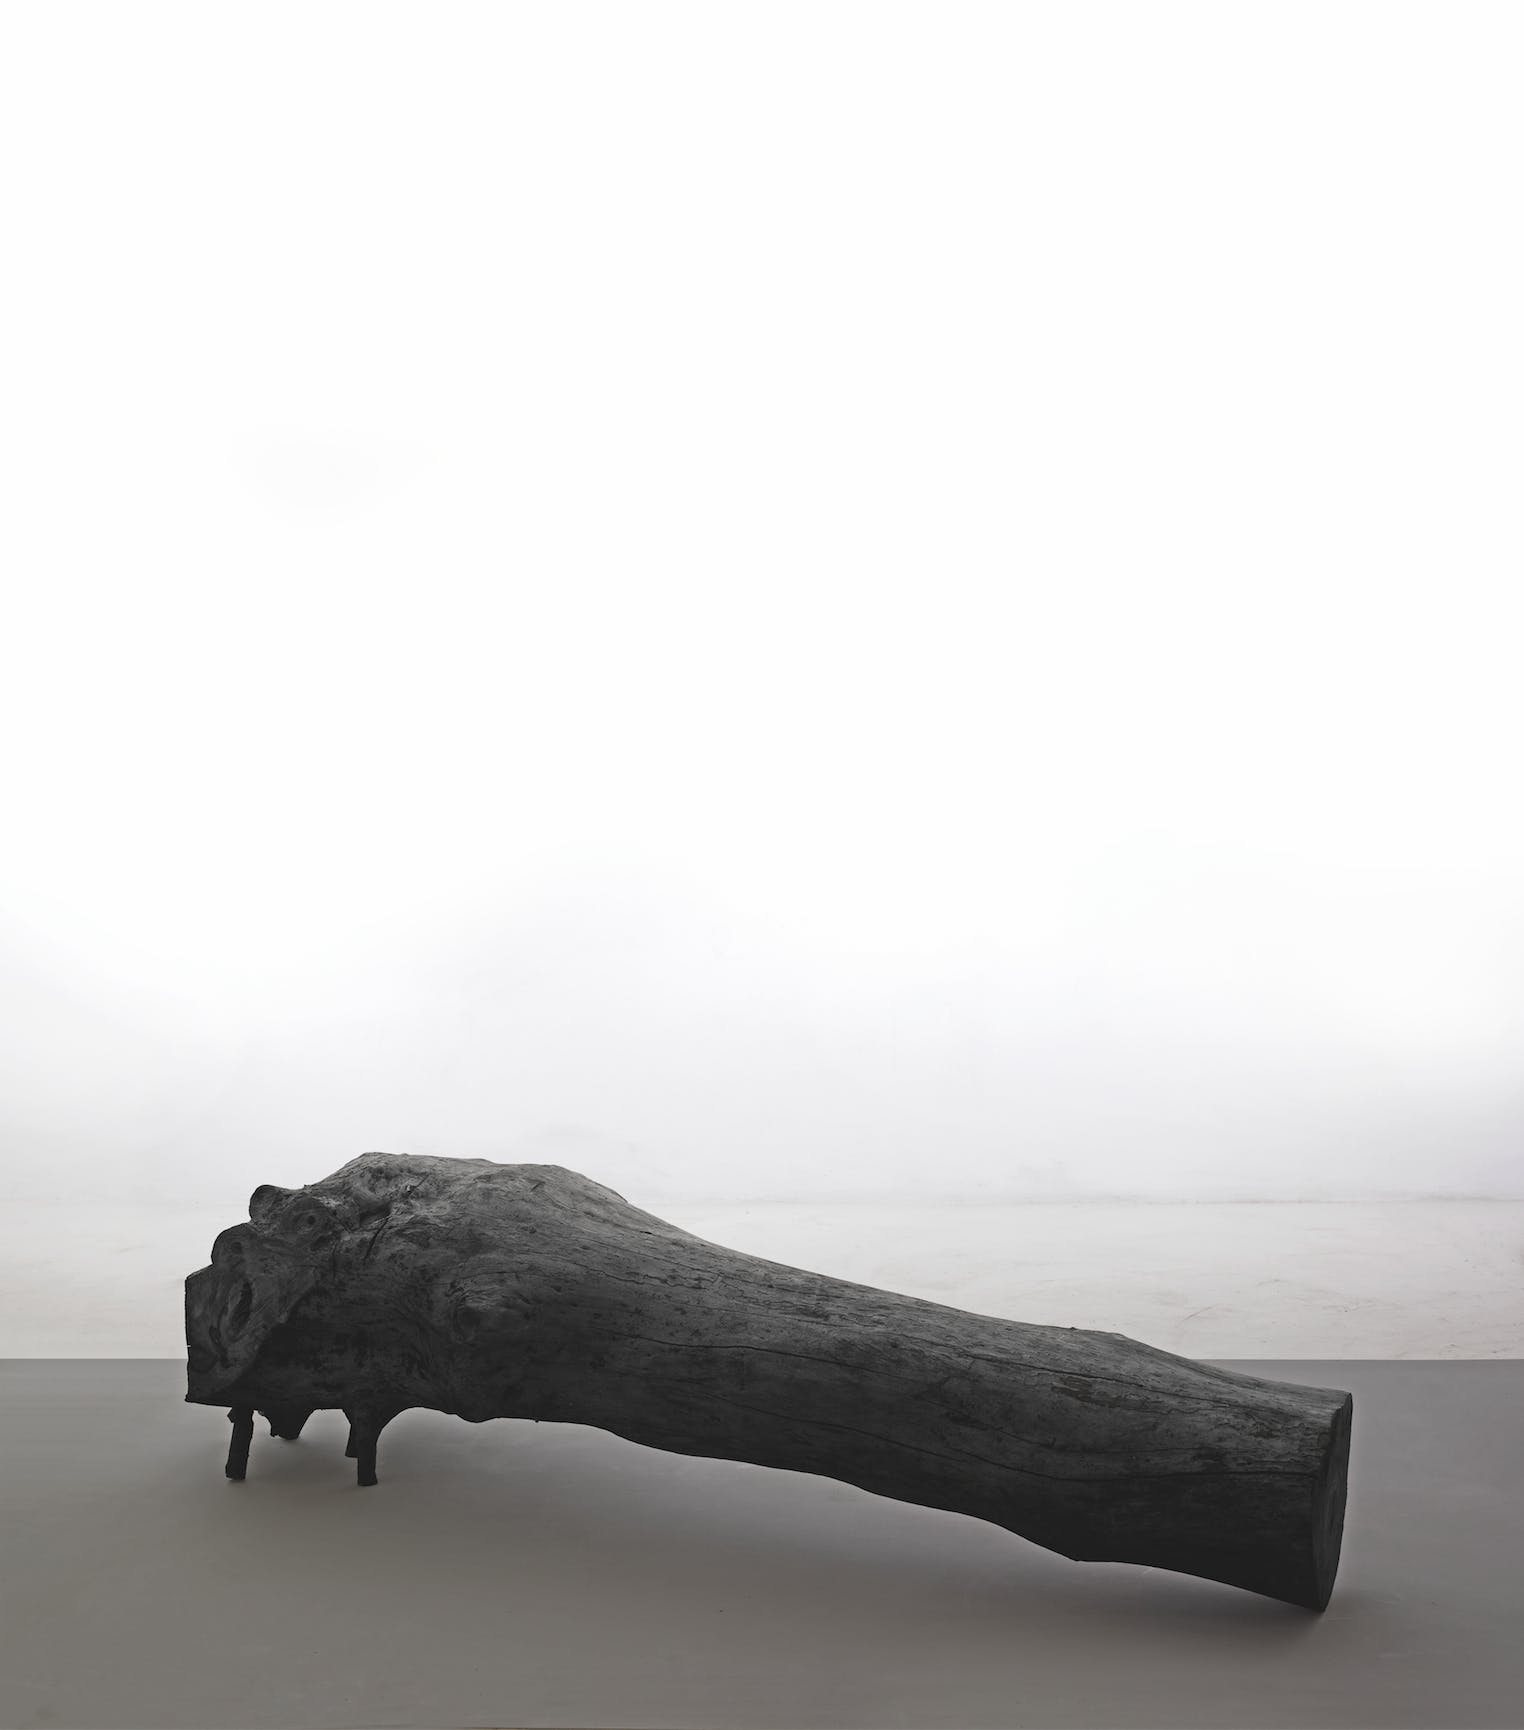 Olmo Bench 1